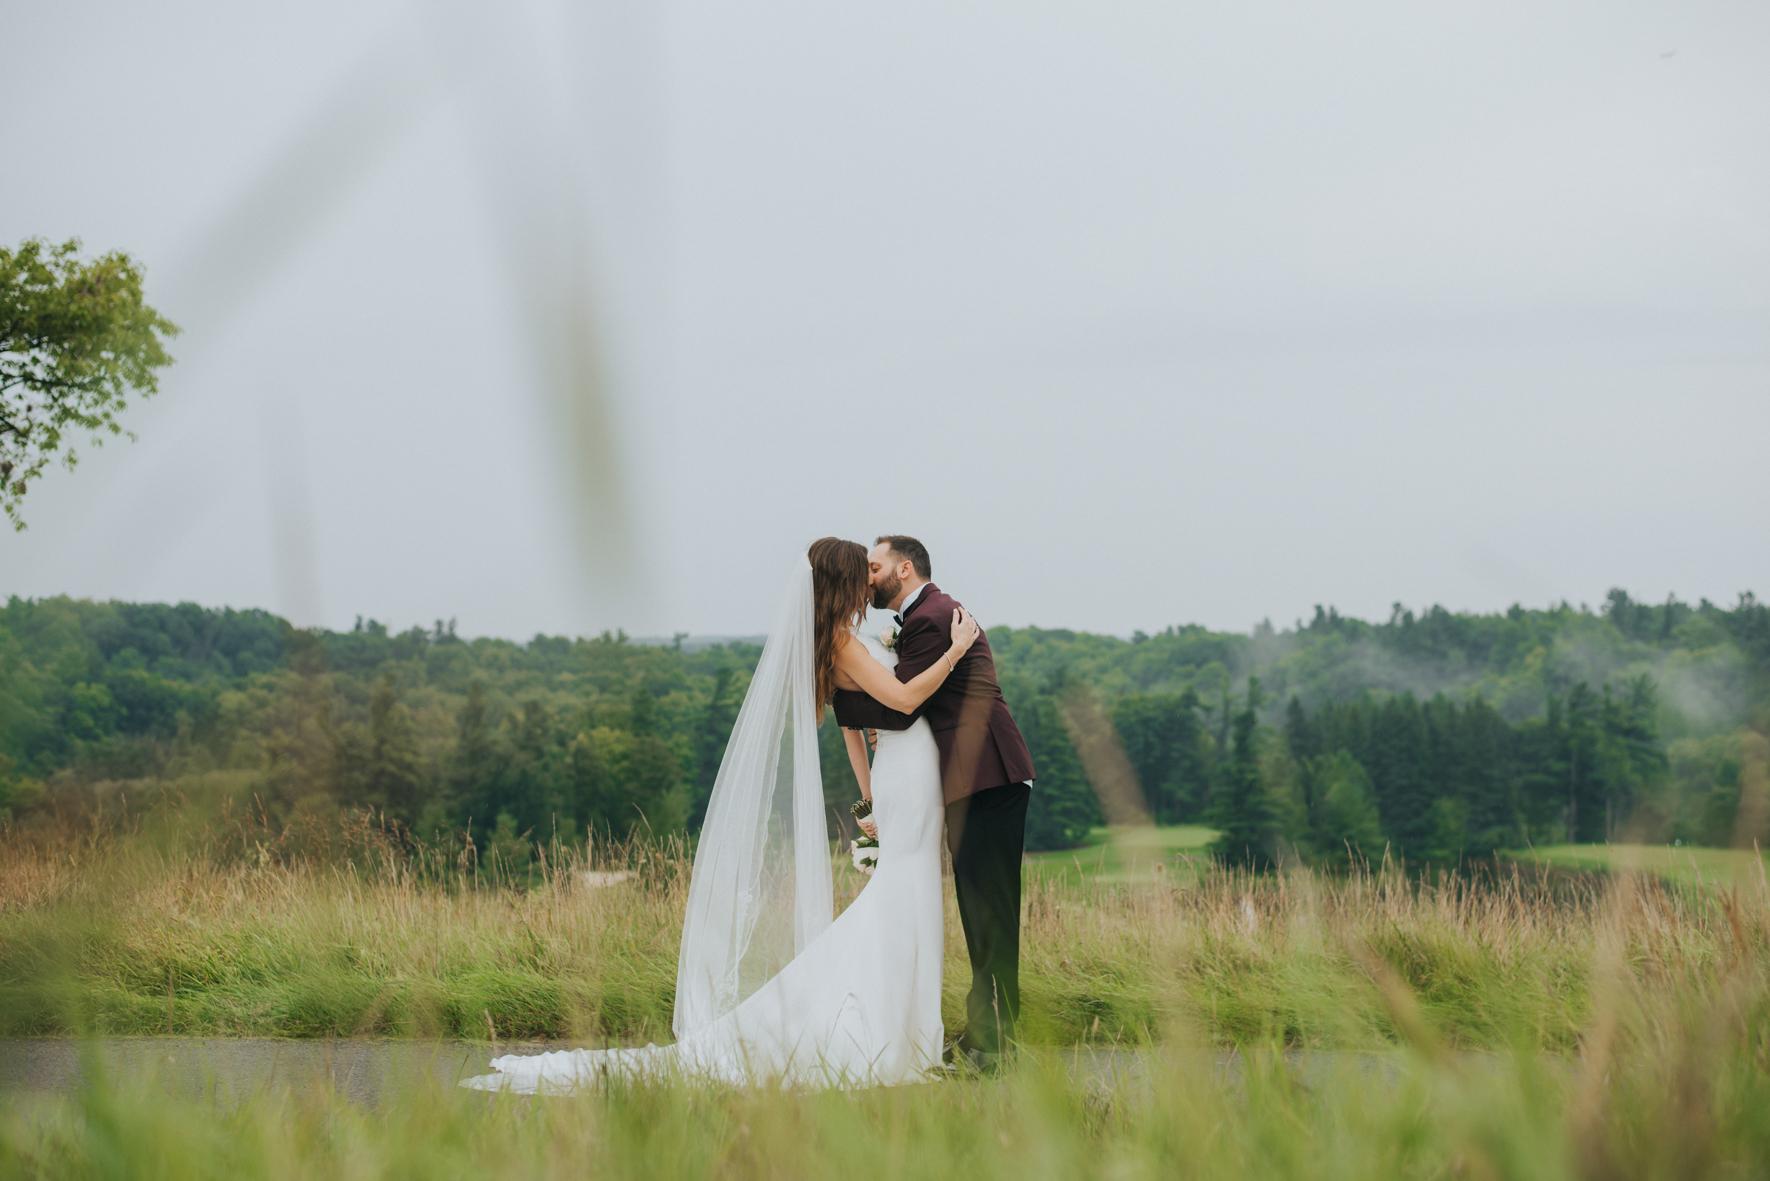 sandy-jana-copper-creek-golf-club-slovak-wedding-toronto-scandaleuse-photography-weddings-30.jpg